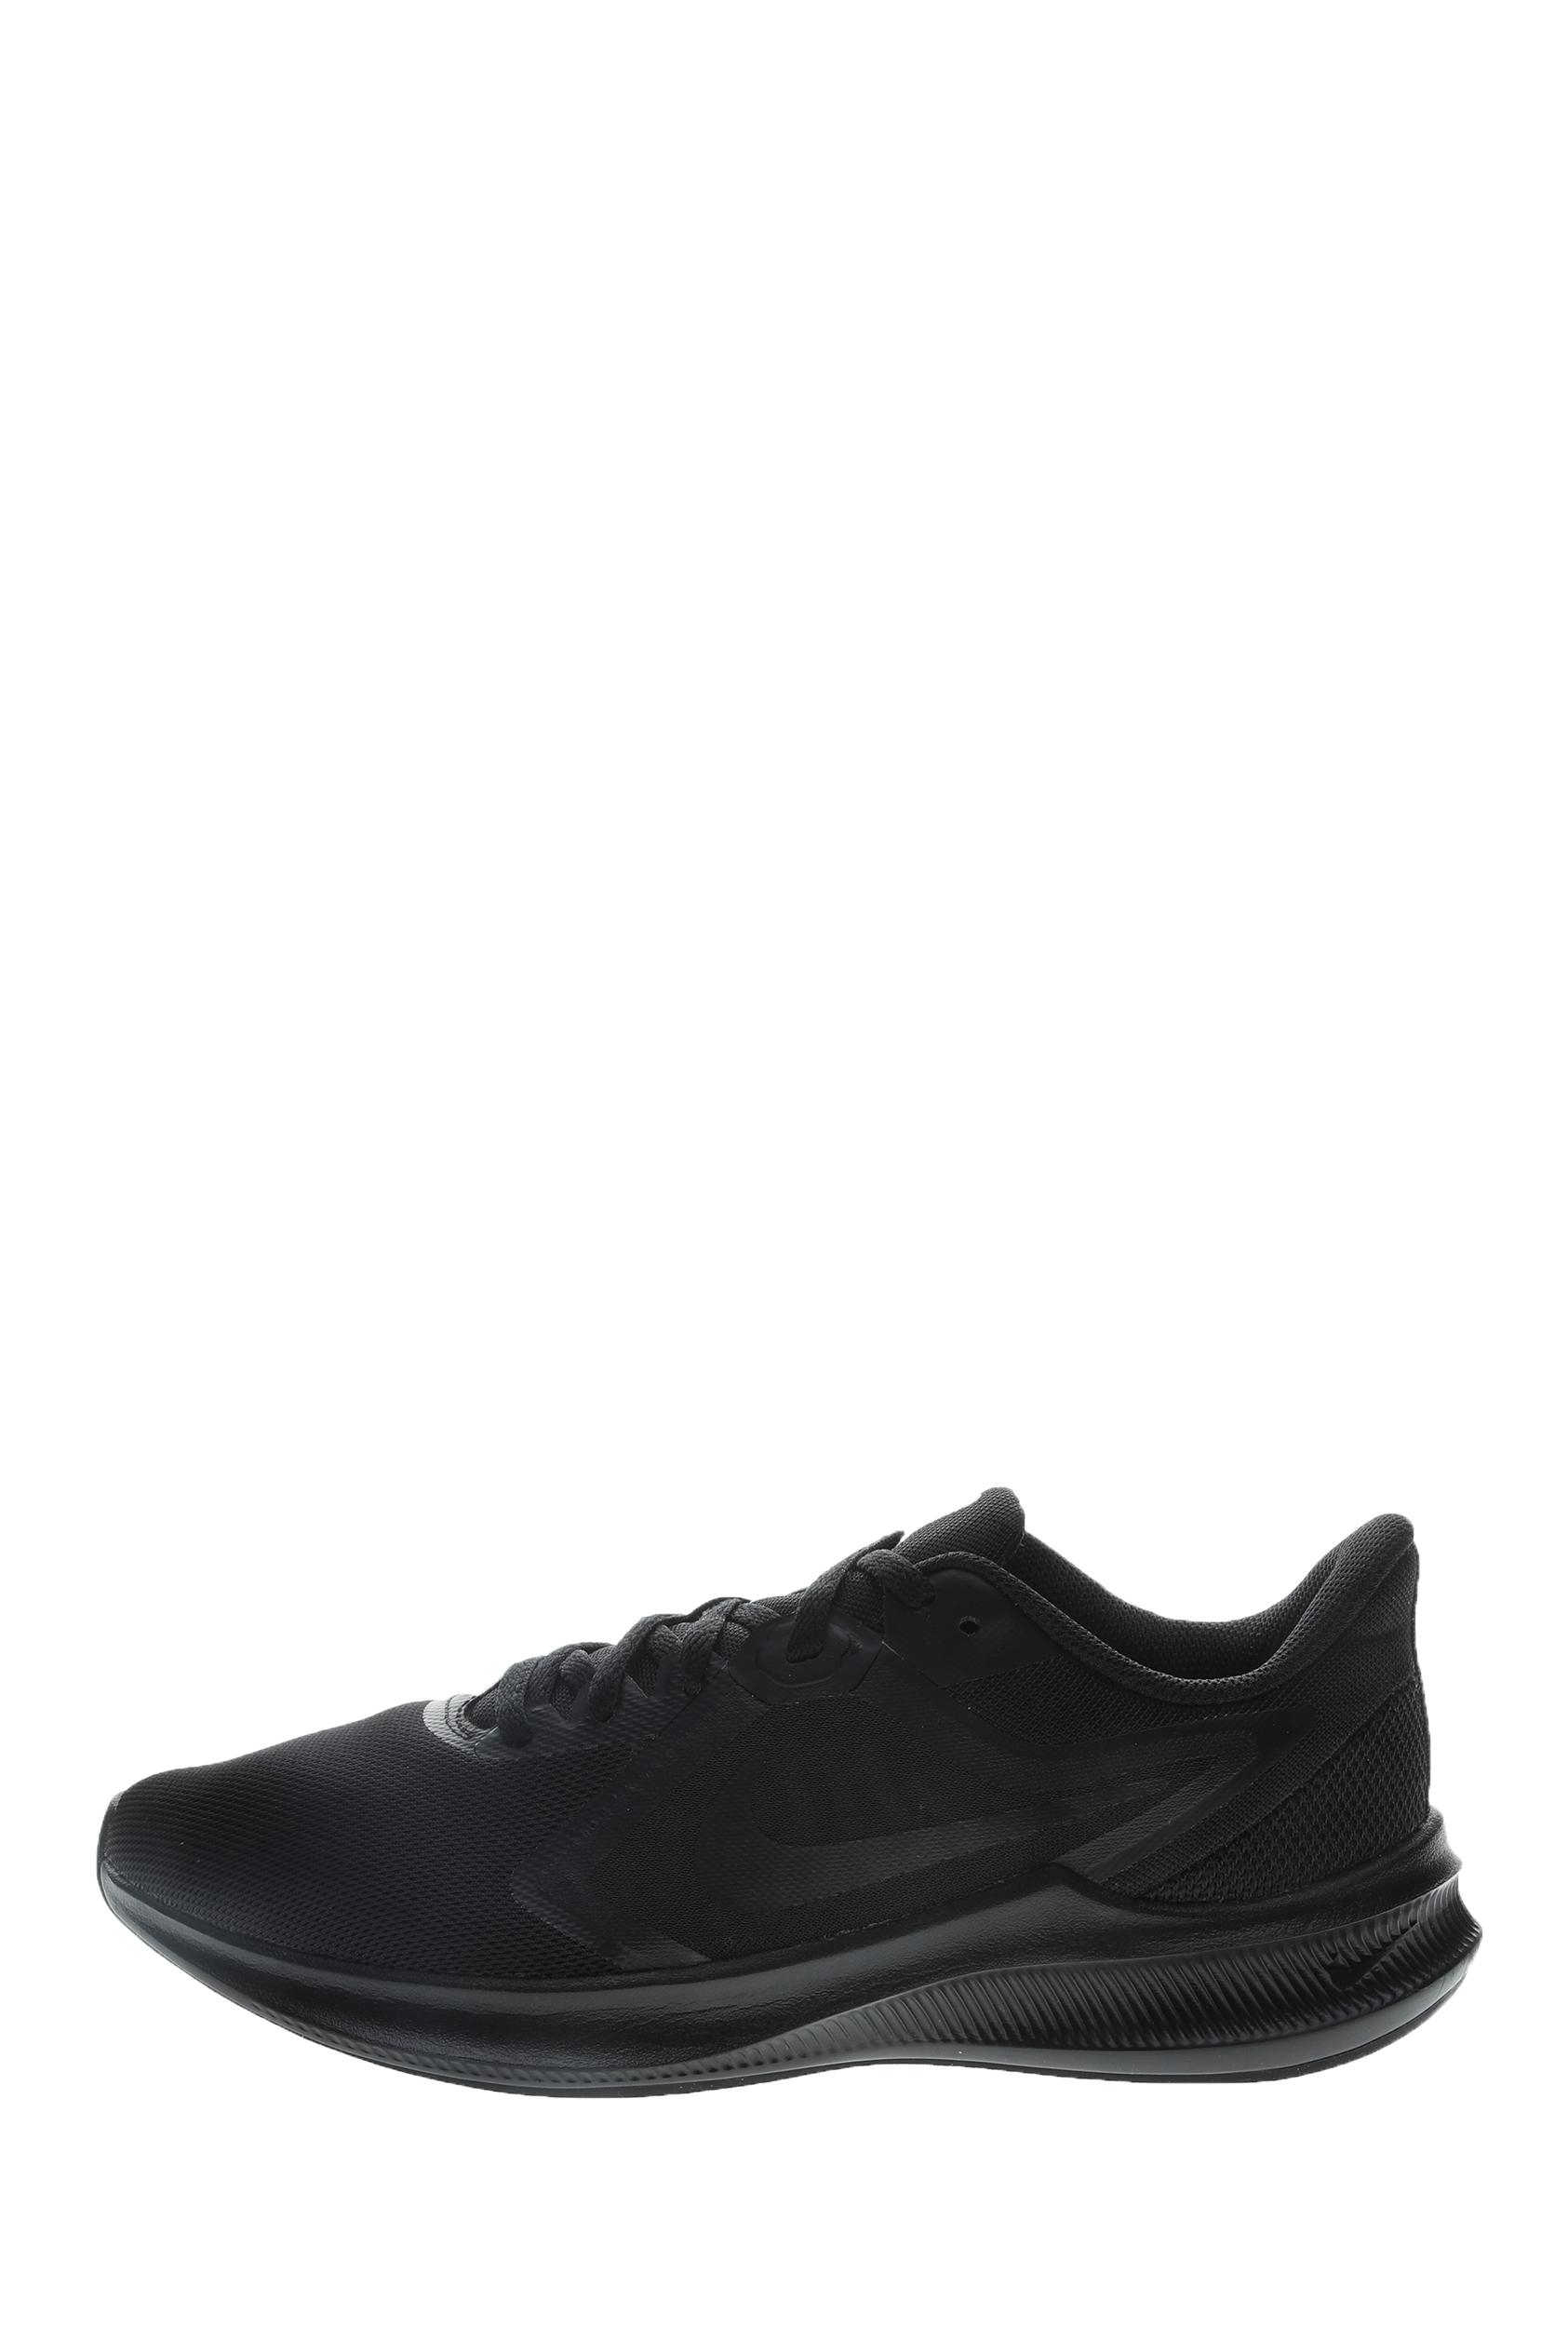 NIKE – Ανδρικά παπούτσια running NIKE DOWNSHIFTER 10 μαύρα